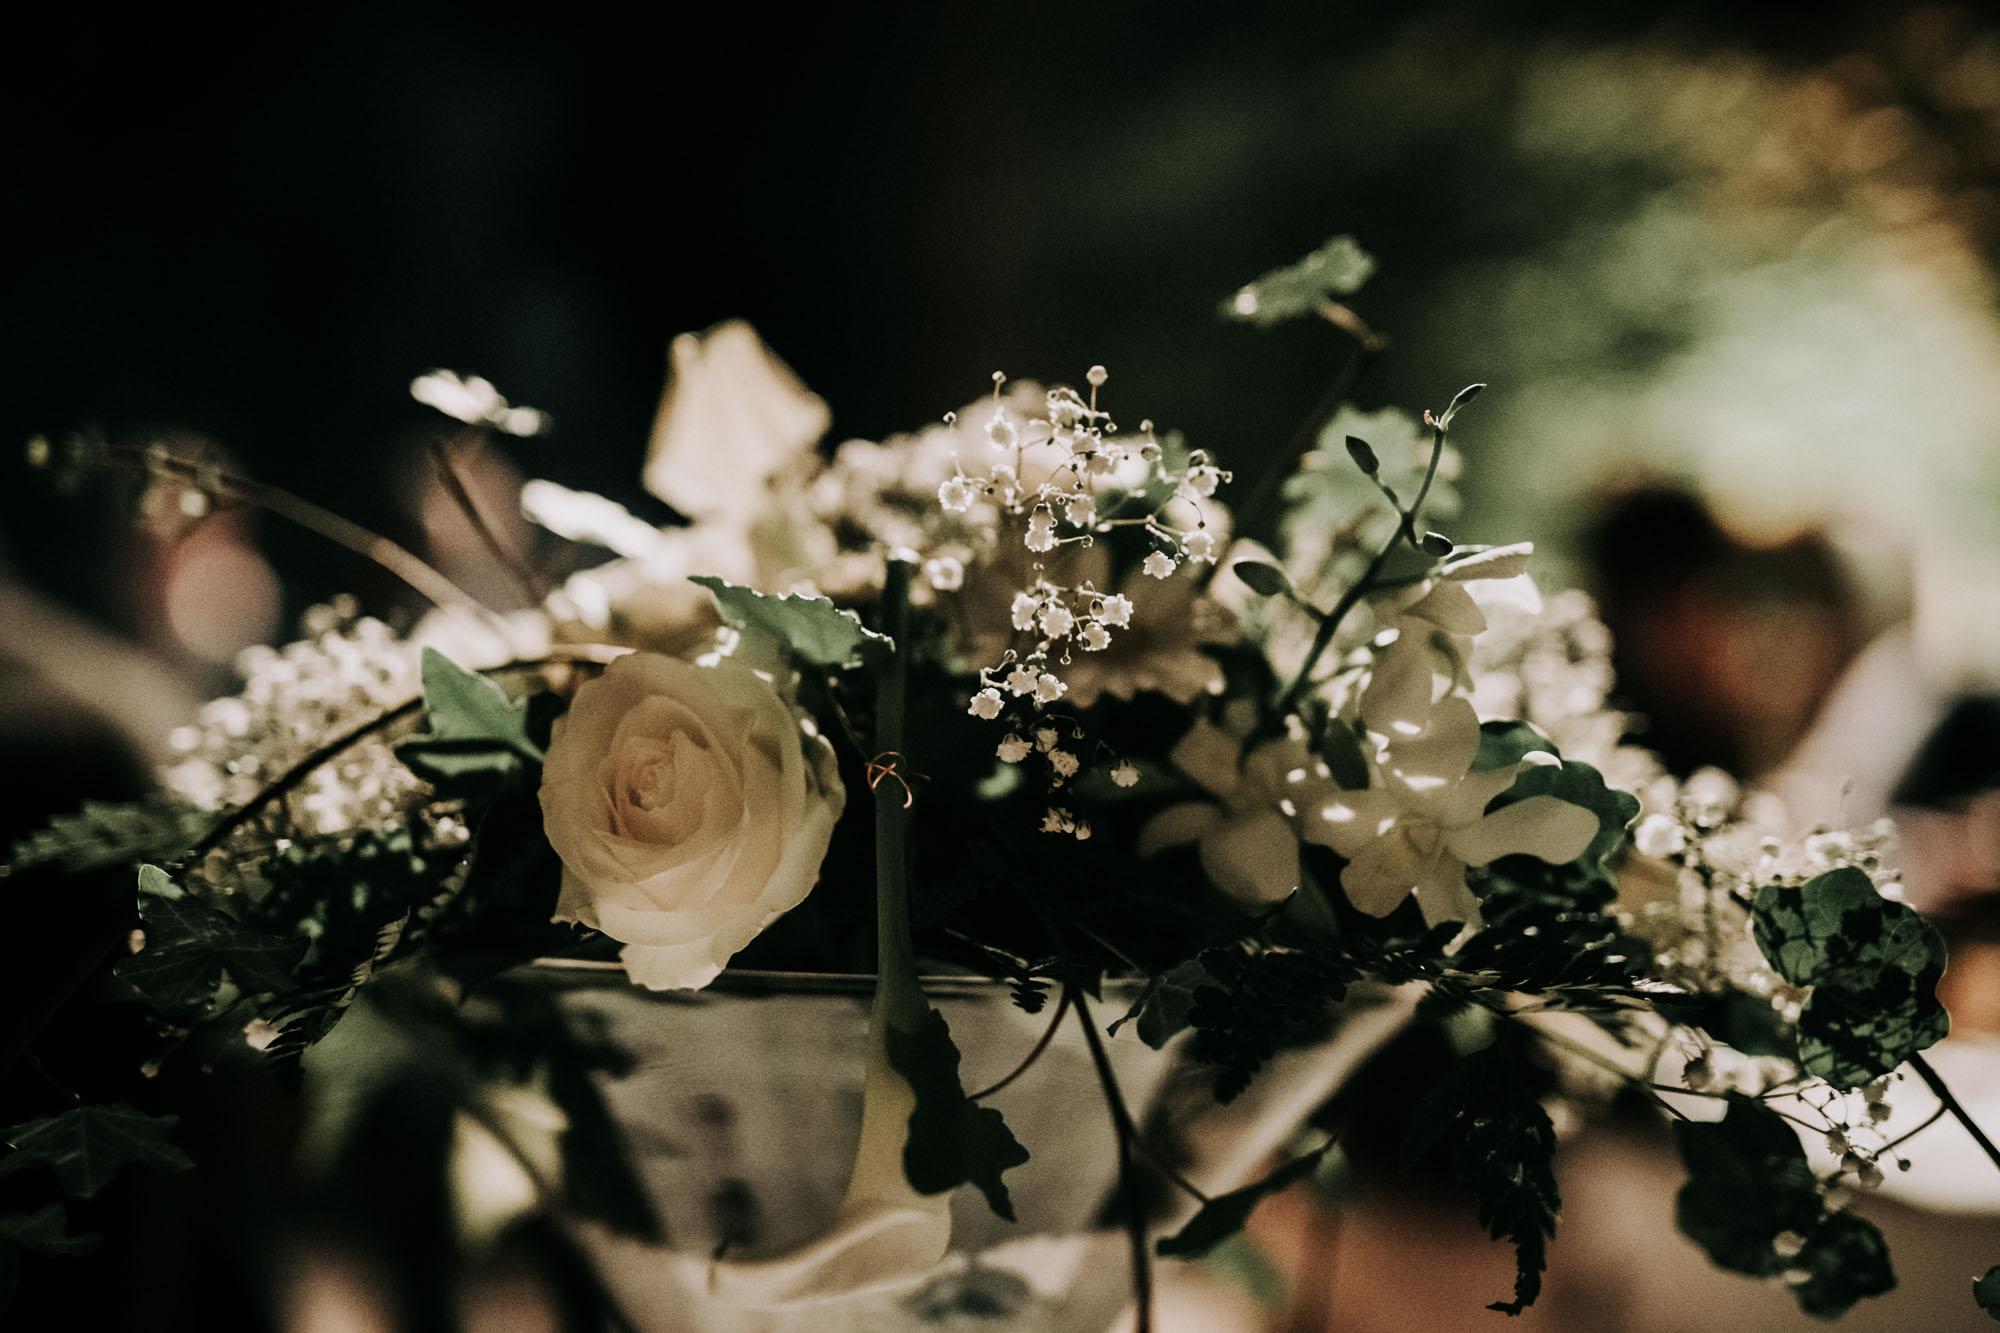 2018-09-29 - LD8_1912 - photographe mariage lyon - laurie diaz - www.lauriediazweeding.com.jpg